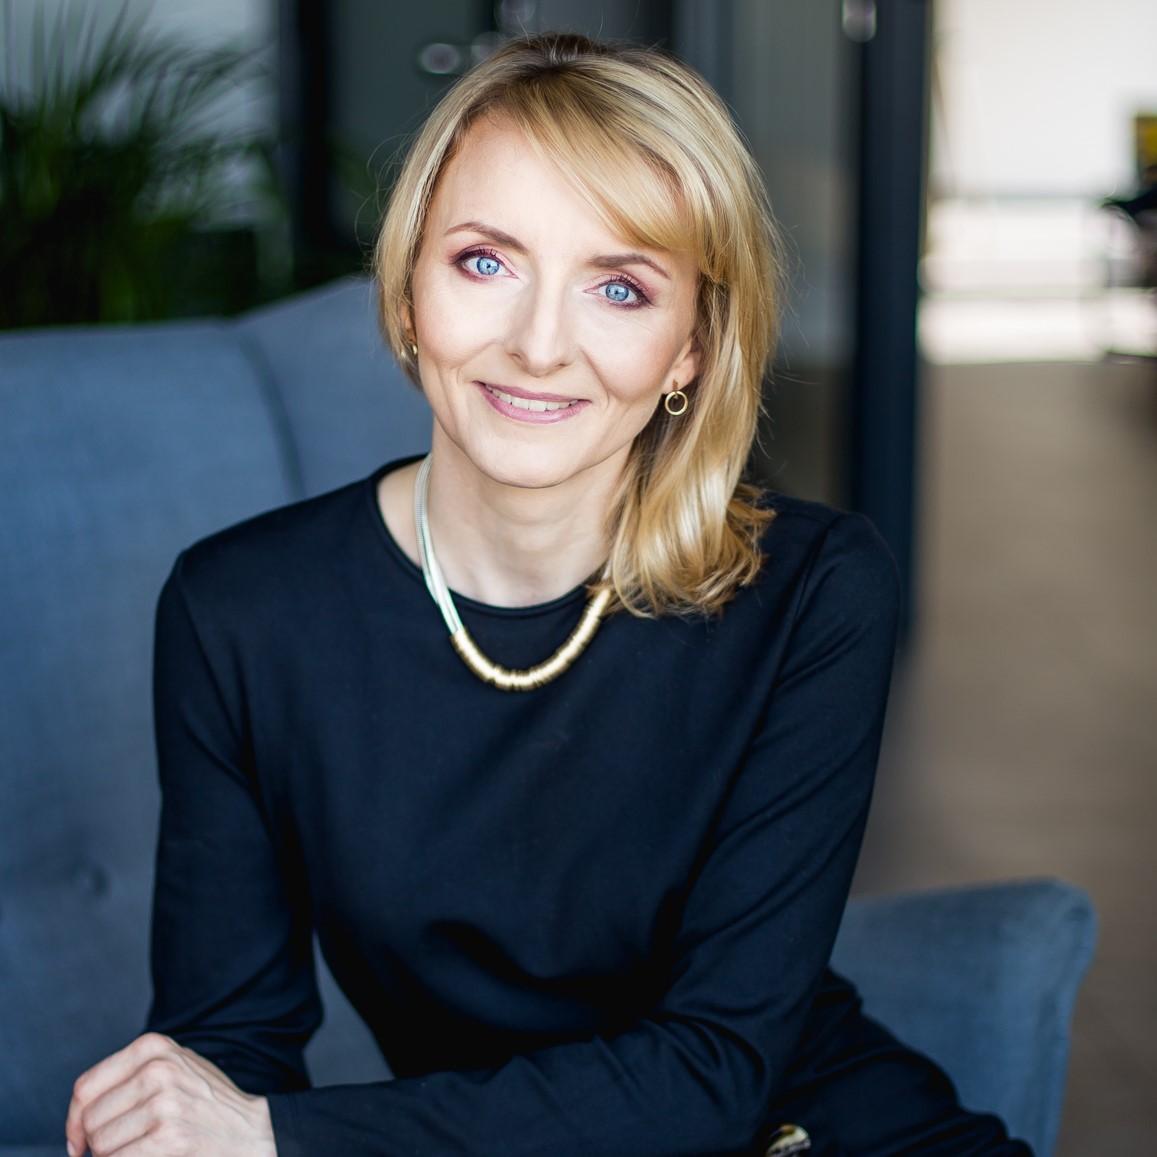 Patricia Polaczuk-Rutkowska